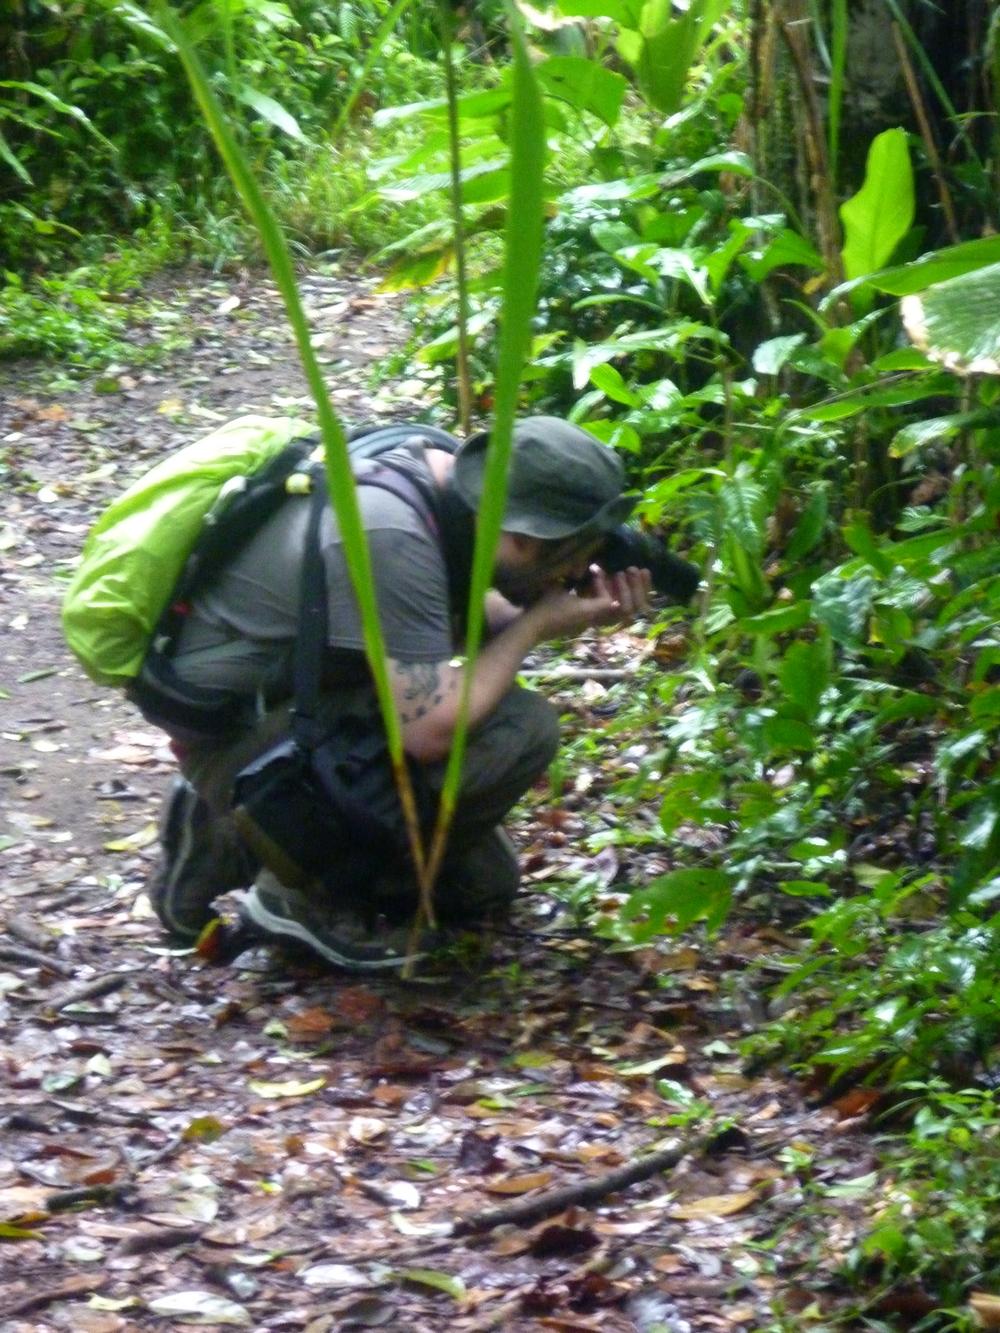 15 jours dans la jungle du Costa Rica 358371johannesr